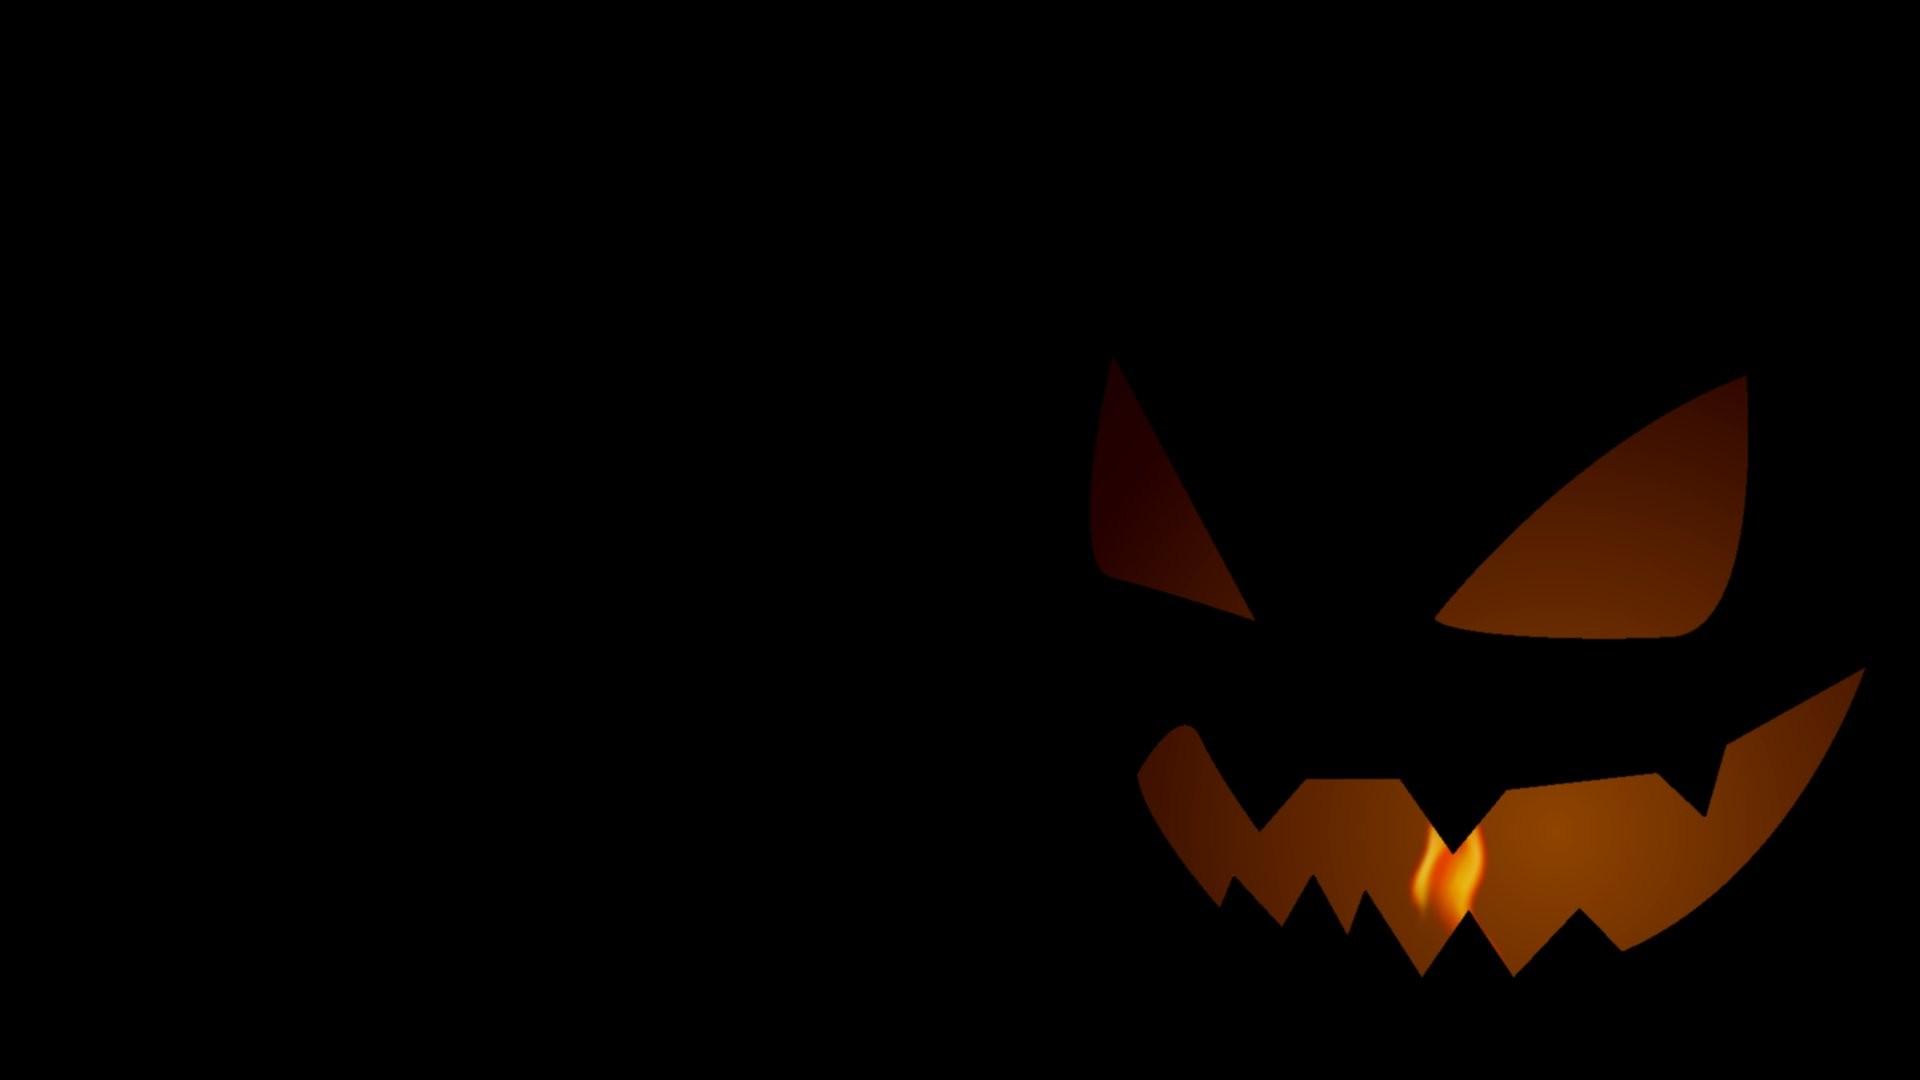 oct 31 thought post few halloween walls /. Halloween Backgrounds …